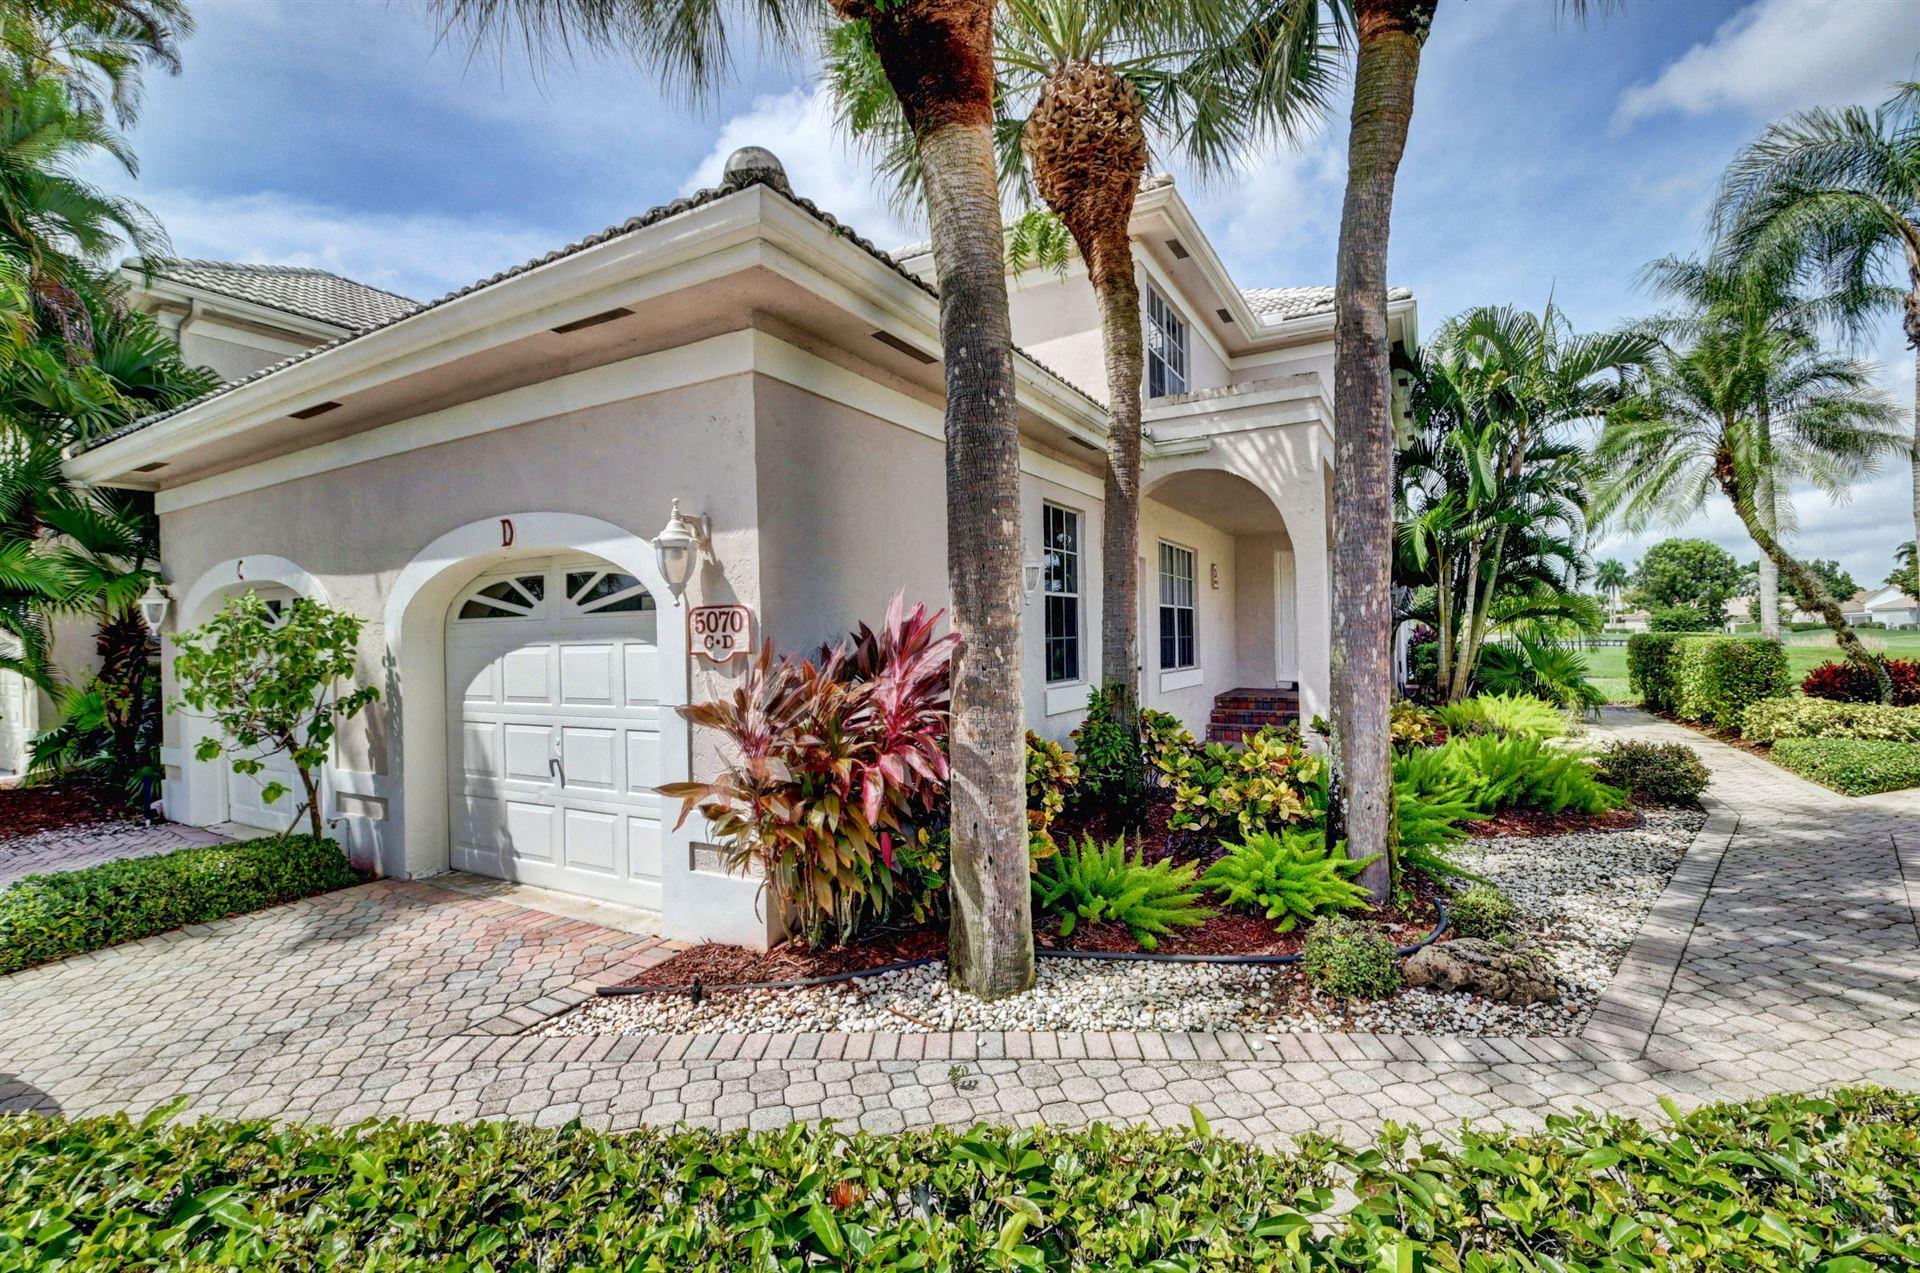 5070 Lake Catalina Drive #D, Boca Raton, FL 33496 - #: RX-10662566